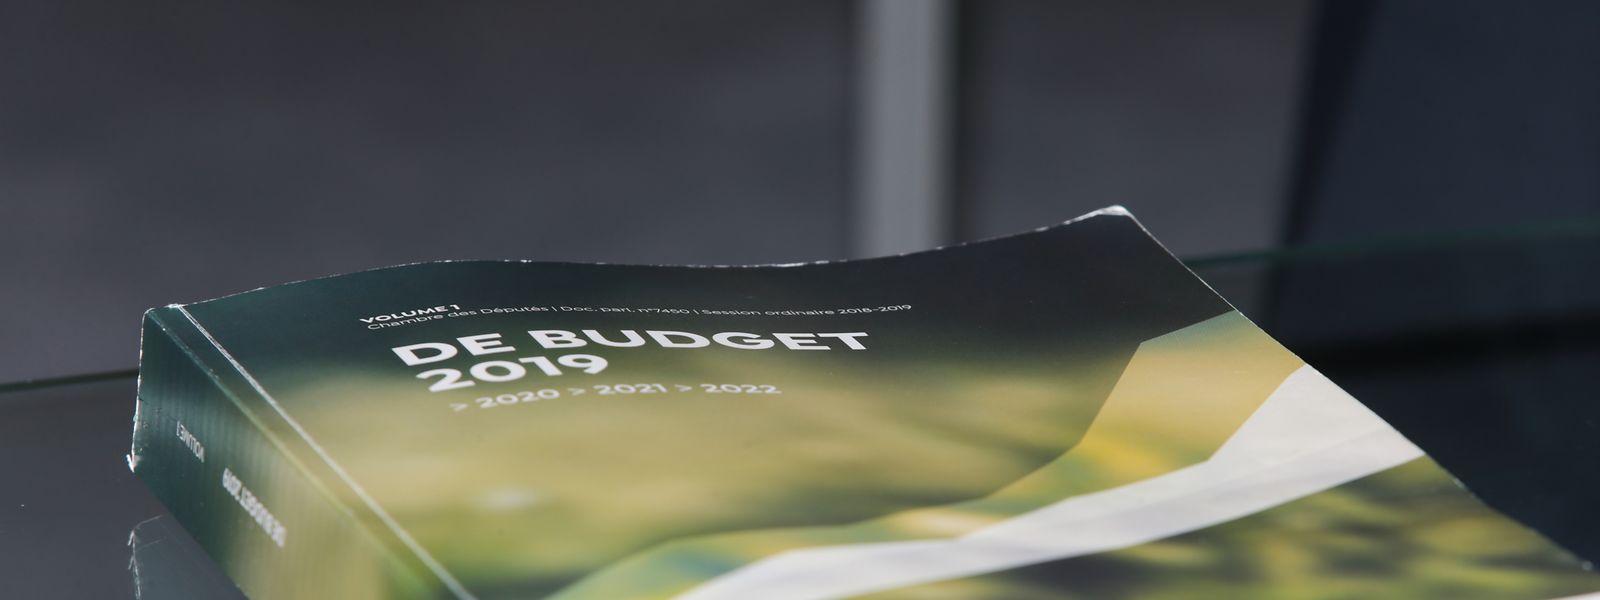 Politik, Budget, DP, André Bauler Foto: Anouk Antony/Luxemburger Wort